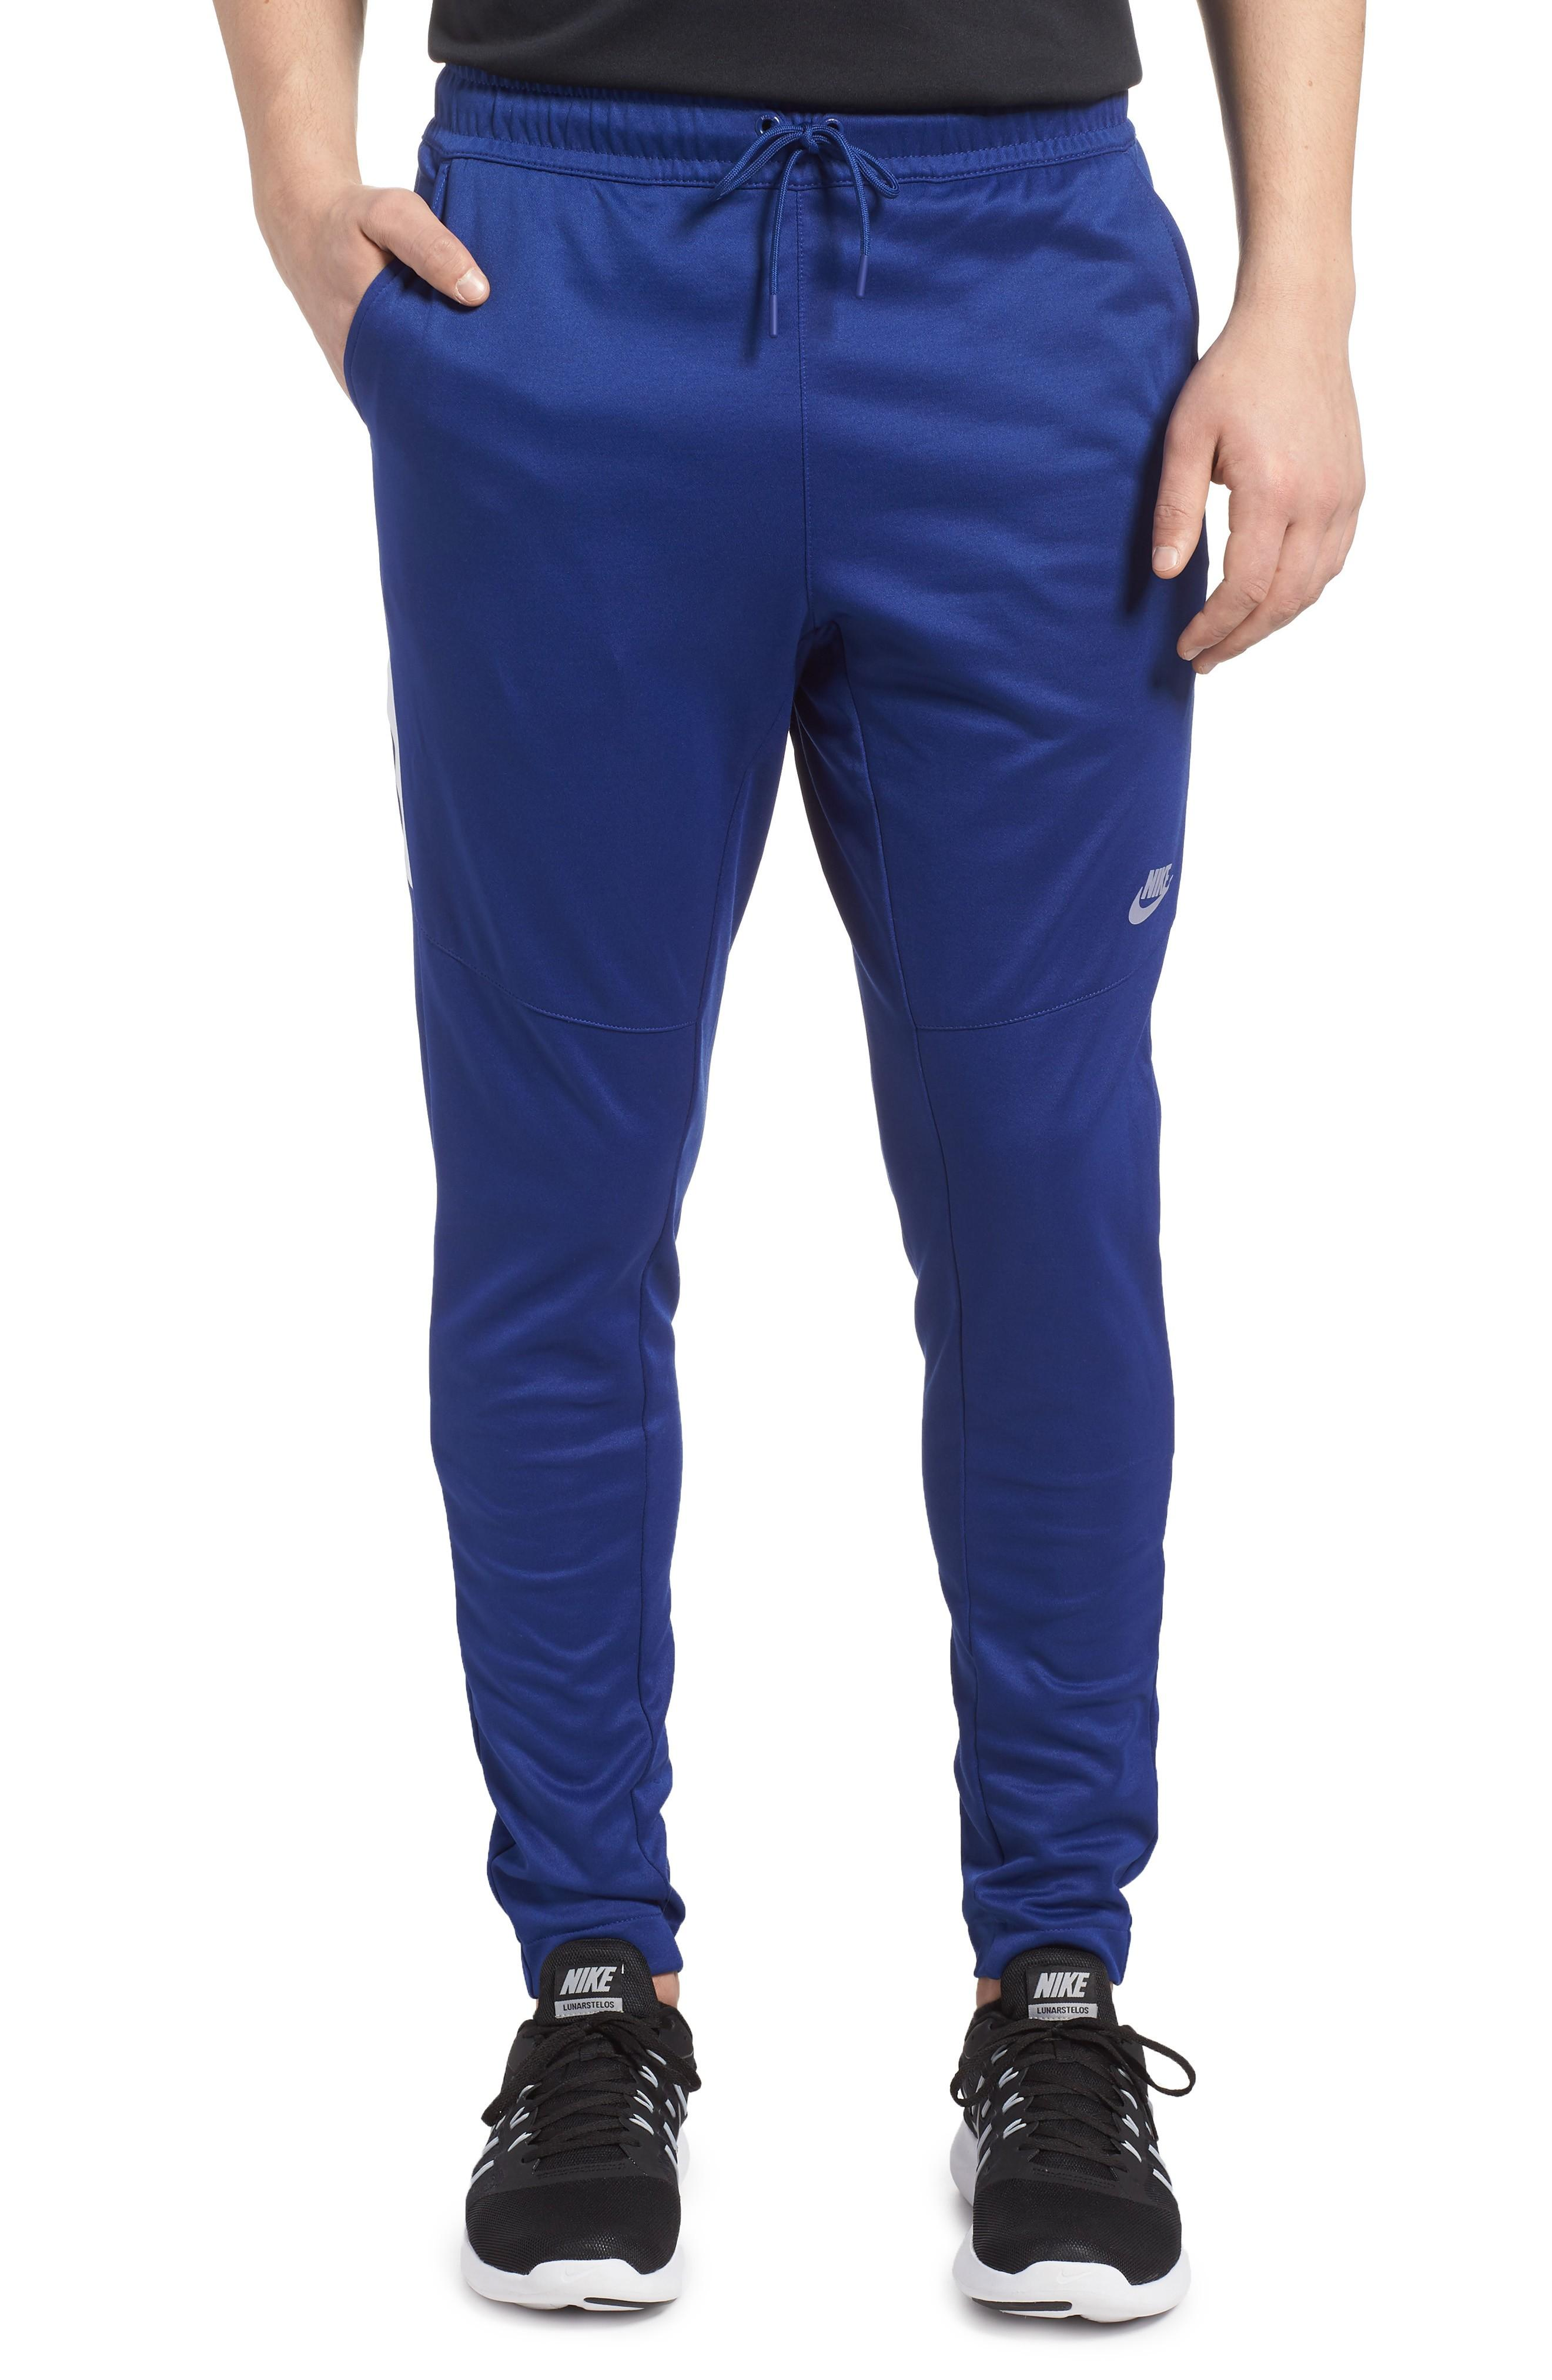 Nike Nsw Tribute Jogger Pants In Deep Royal Blue/ White/ White